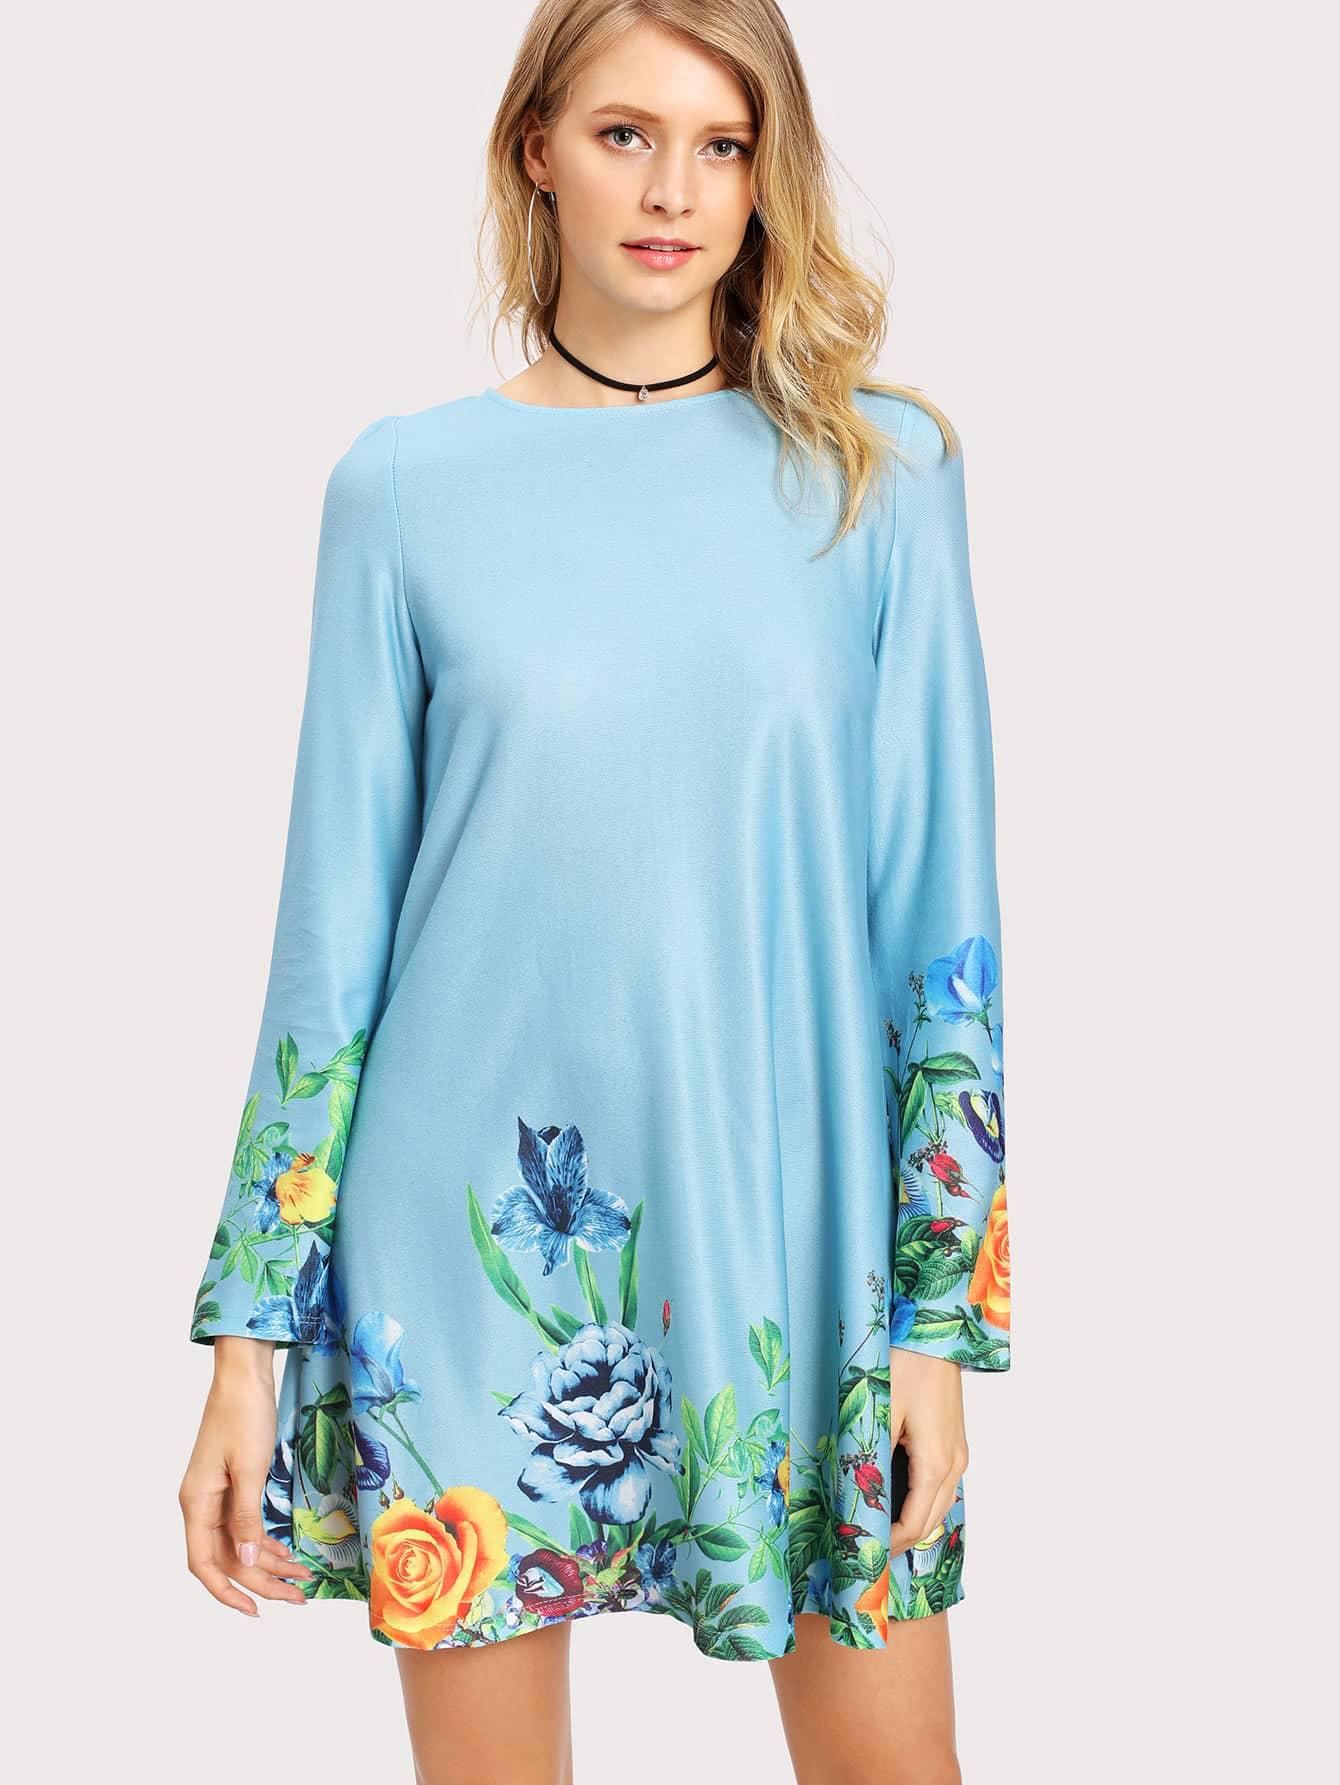 Botanical Print Trim Dress scalloped edge botanical print dress